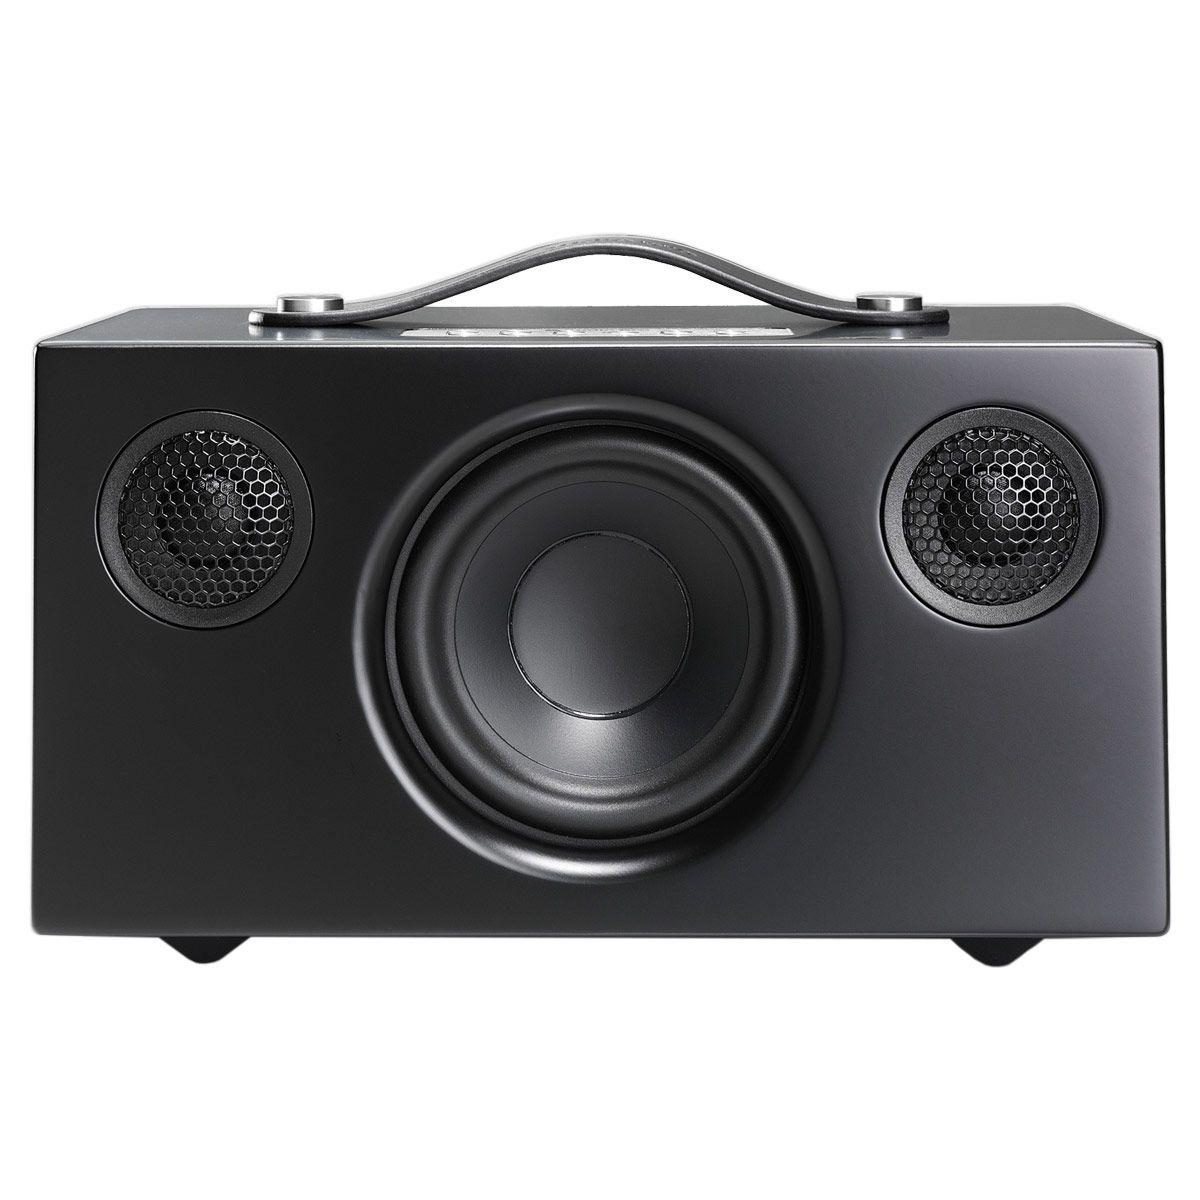 Enceinte bluetooh Audio Pro Addon T4